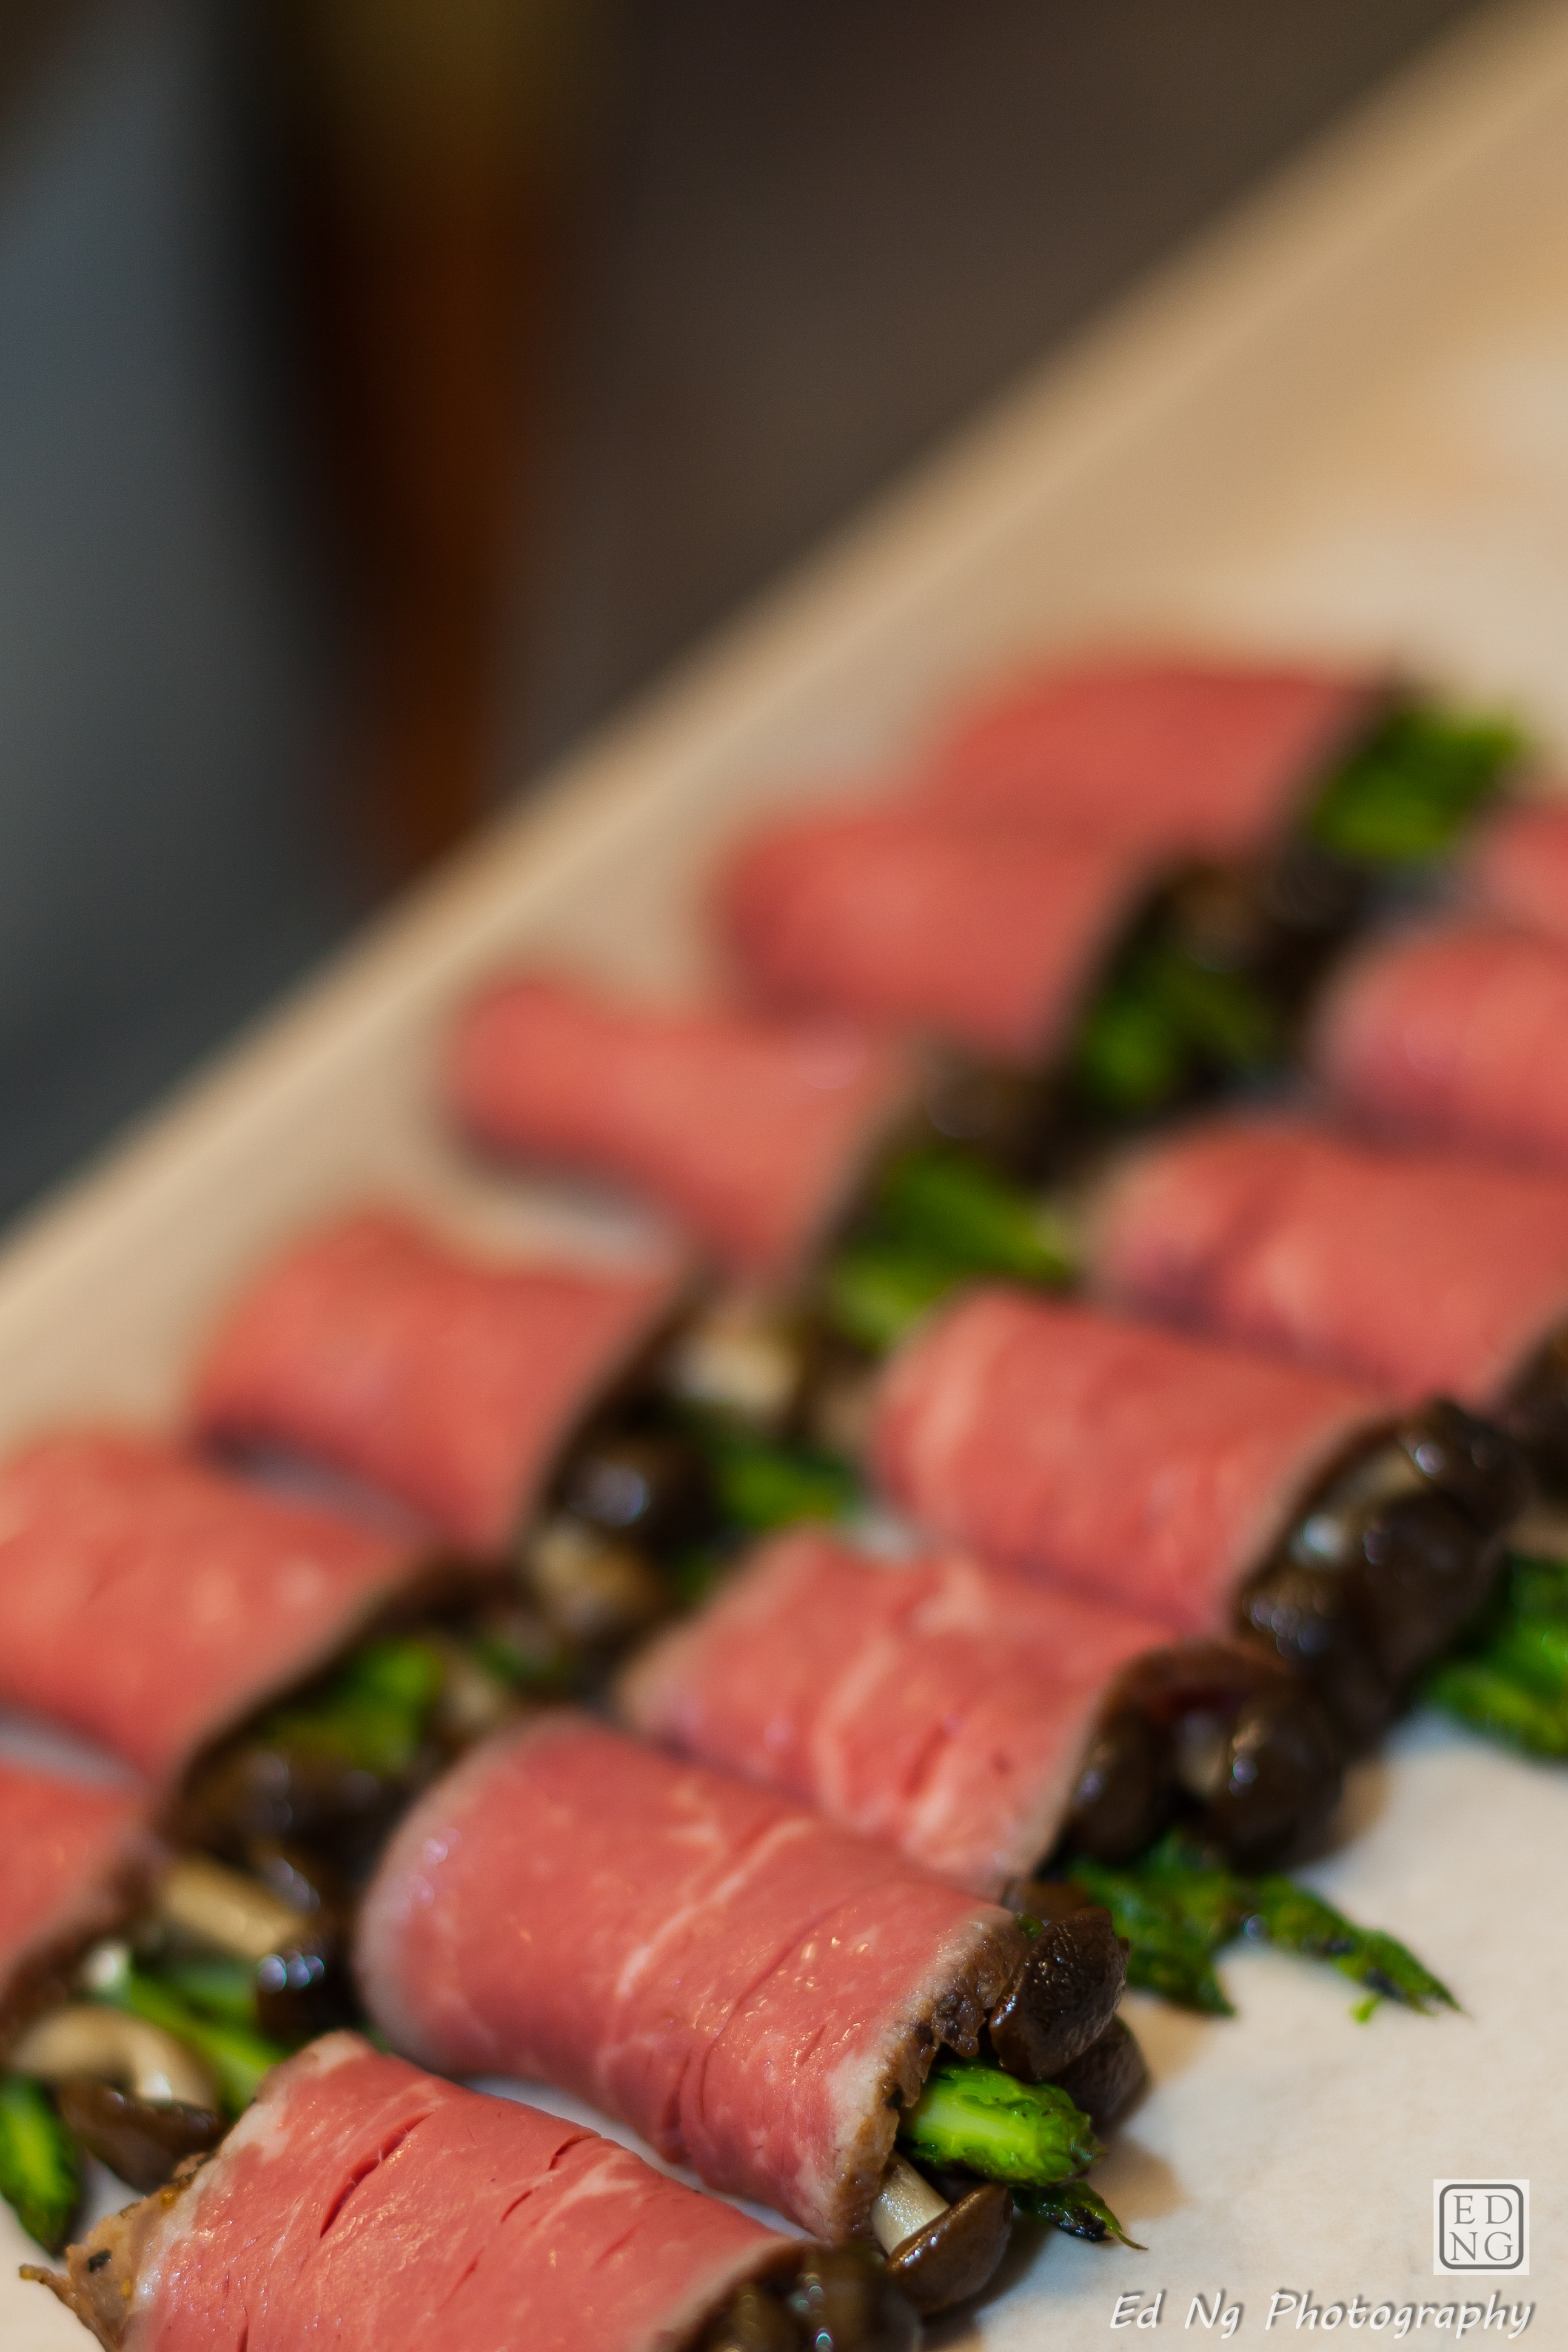 Roast beef, asparagus, cambozola